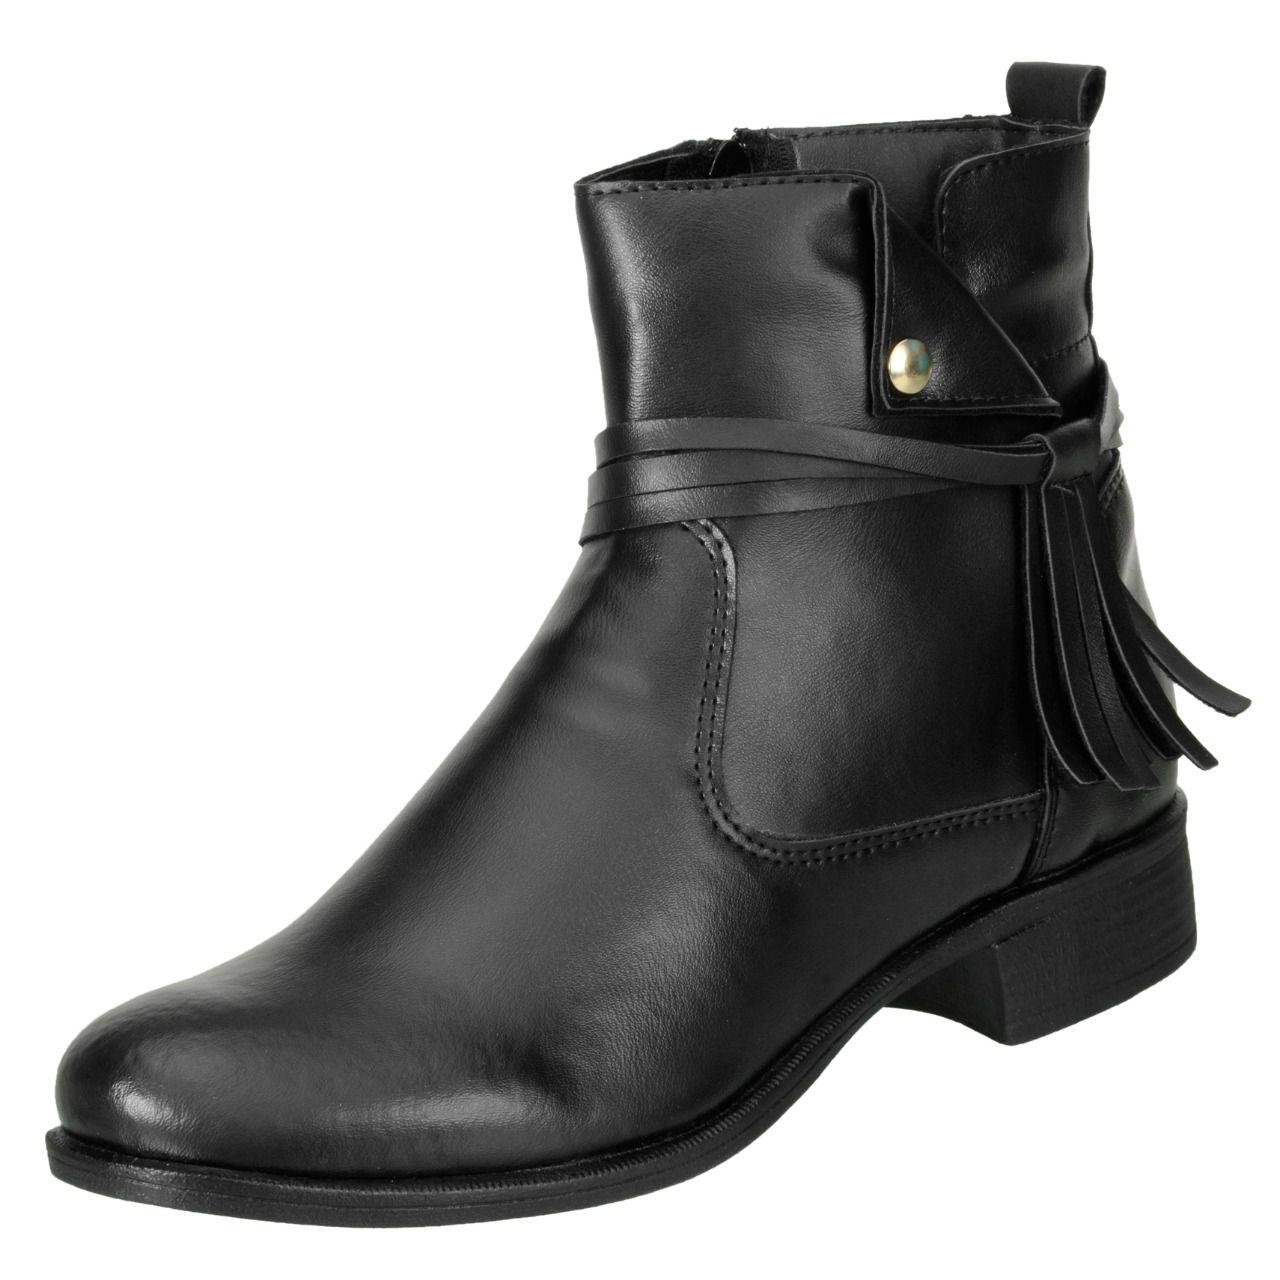 Bota Cano Curto DuduDias Ankle Boot 070 Couro Preto